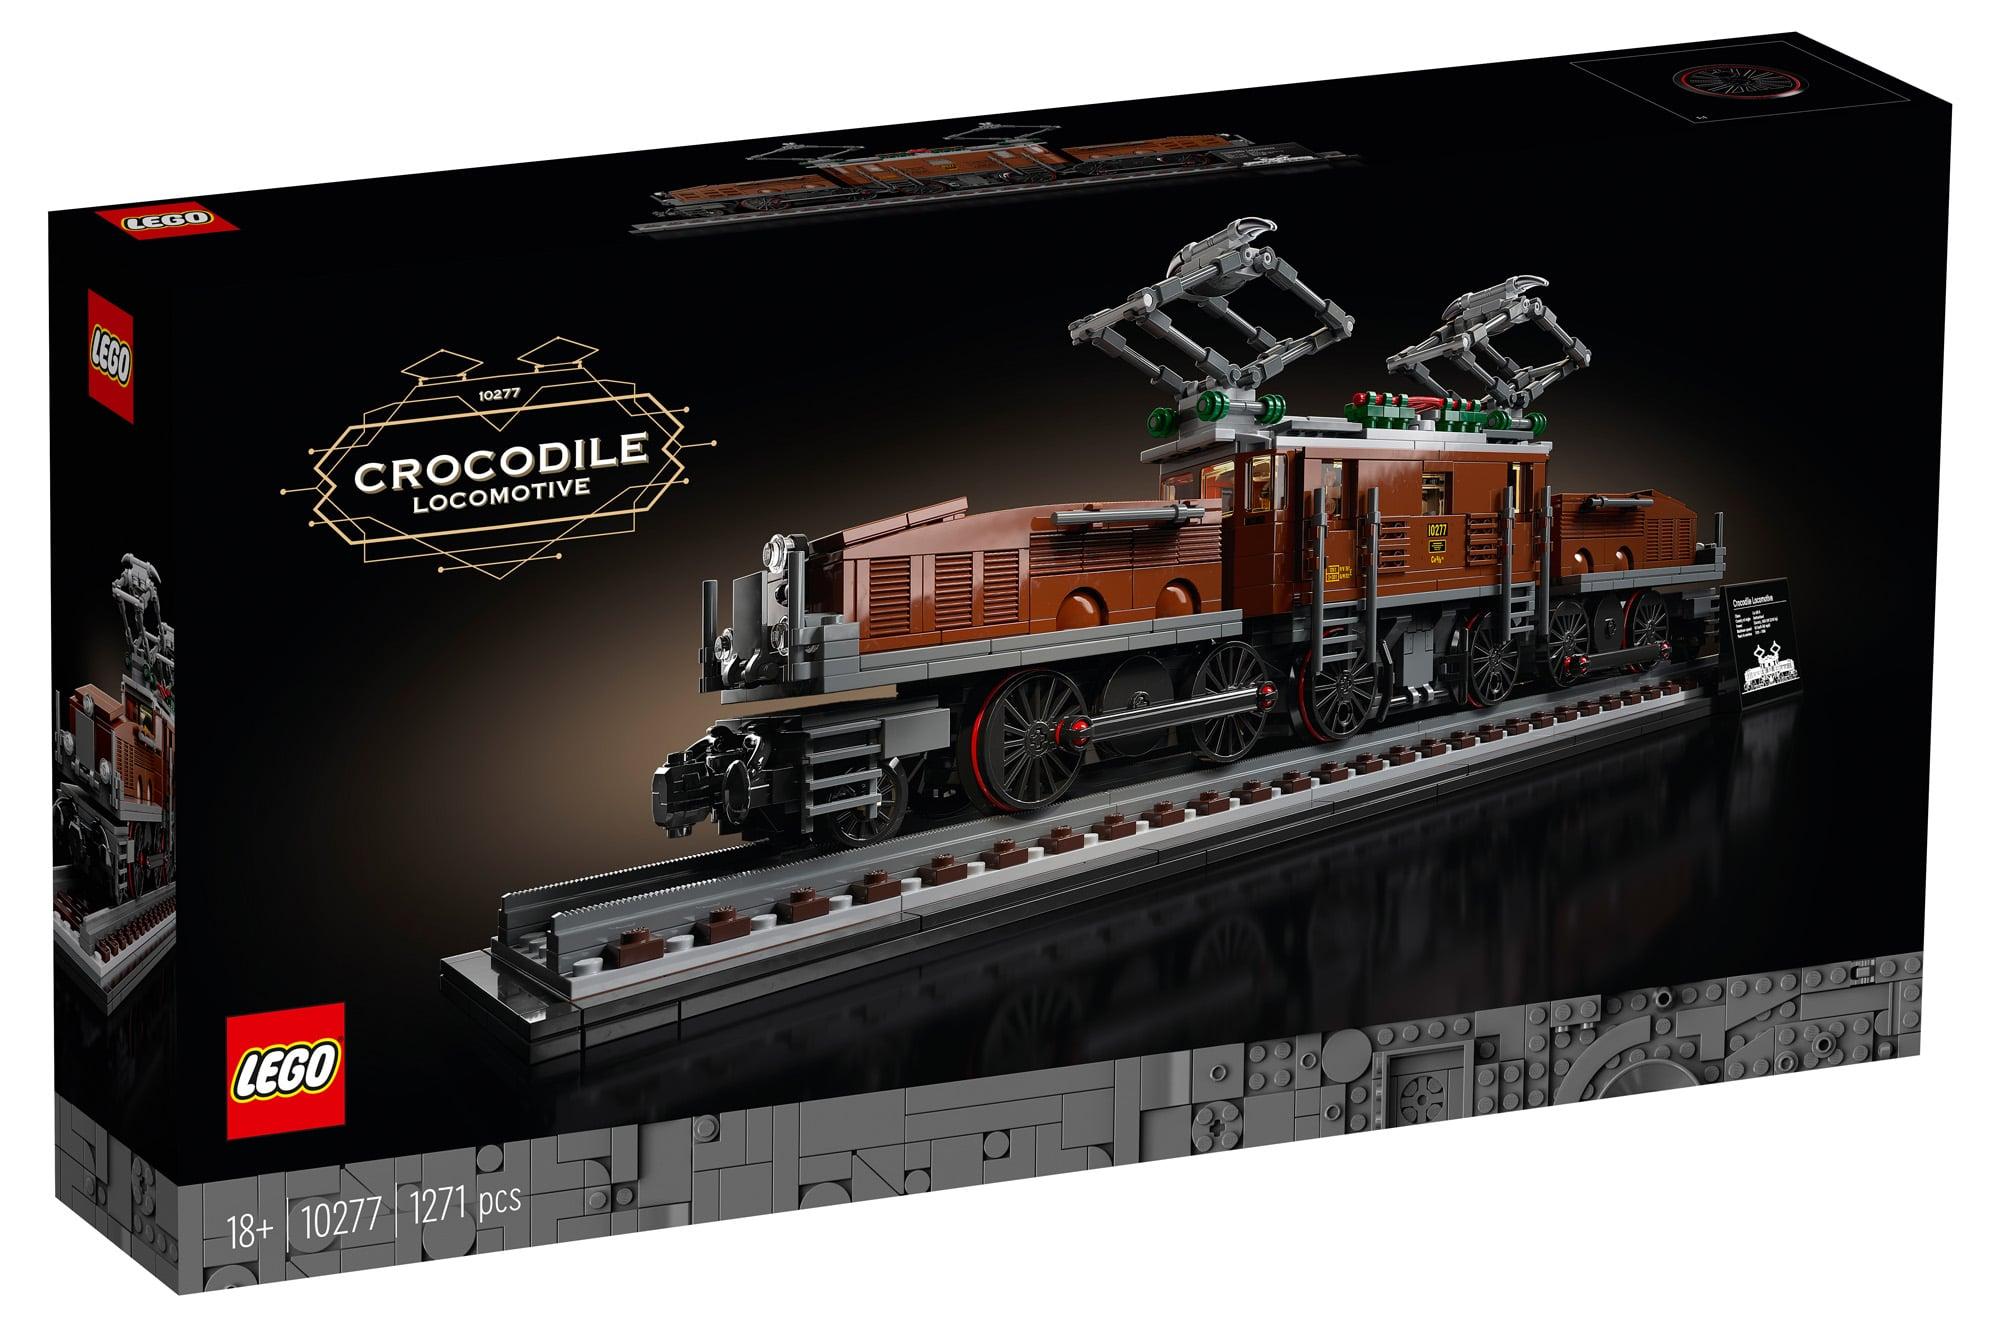 LEGO 10277 Krokodil Lokomotive (Box Vorderseite)